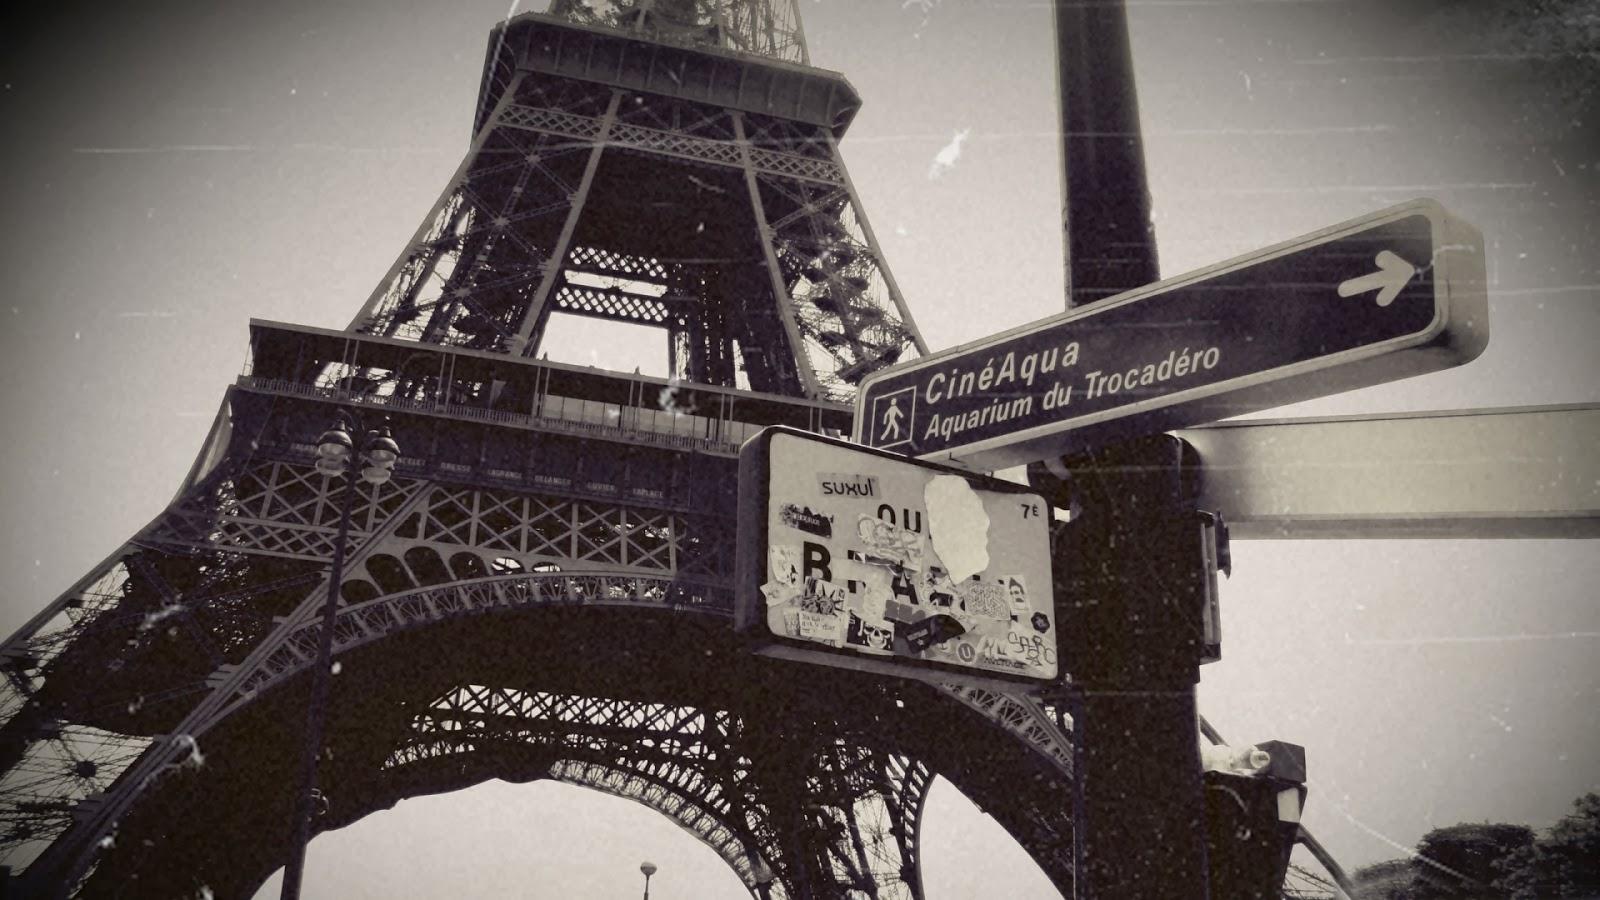 Vintage eiffel tower tumblr photography